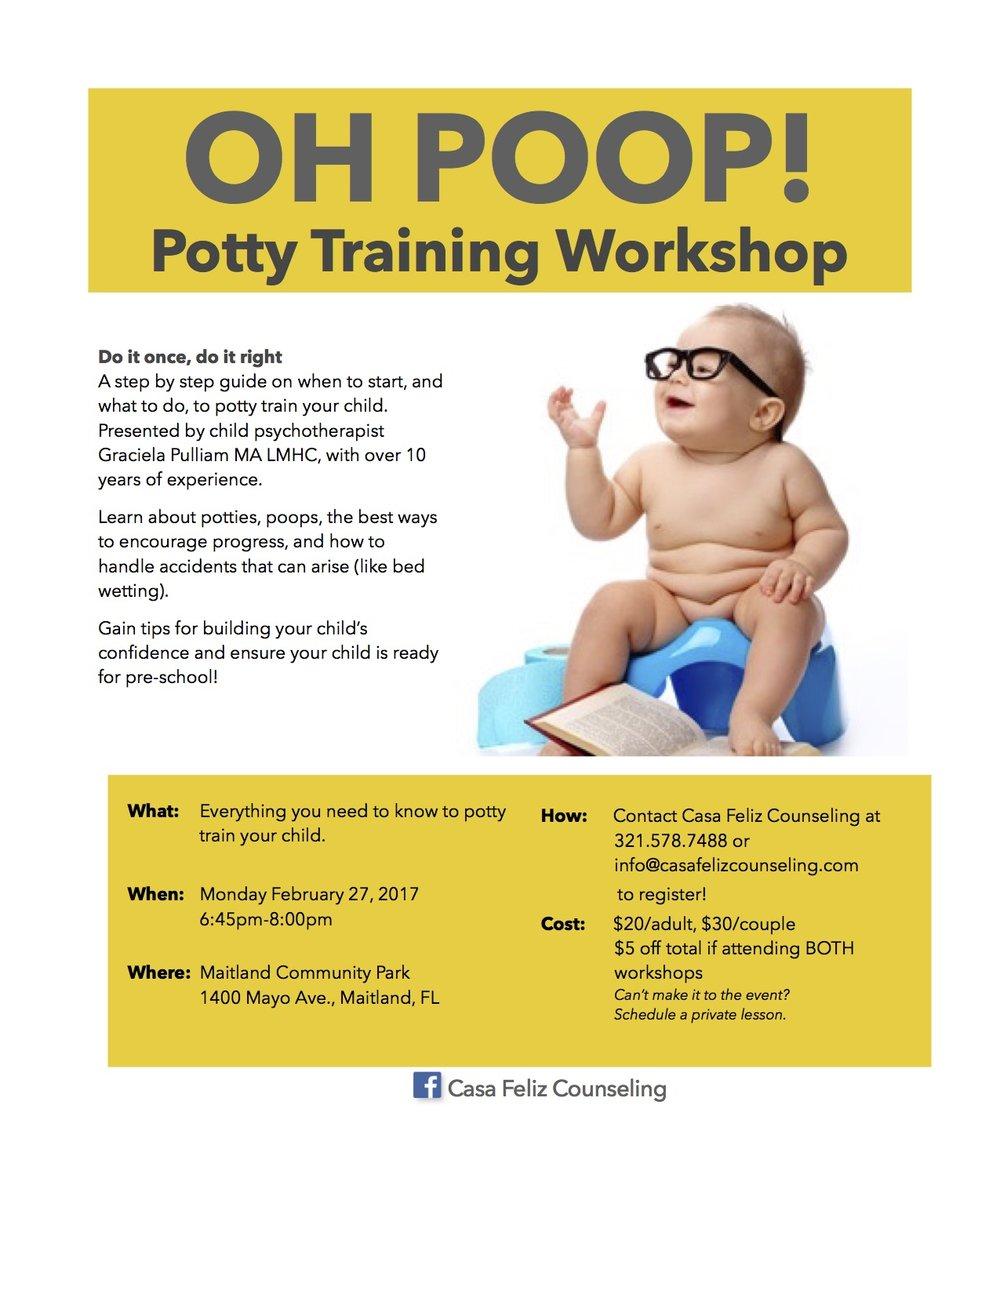 Potty Training Flyer BBC Feb 2017 JPEG.jpg